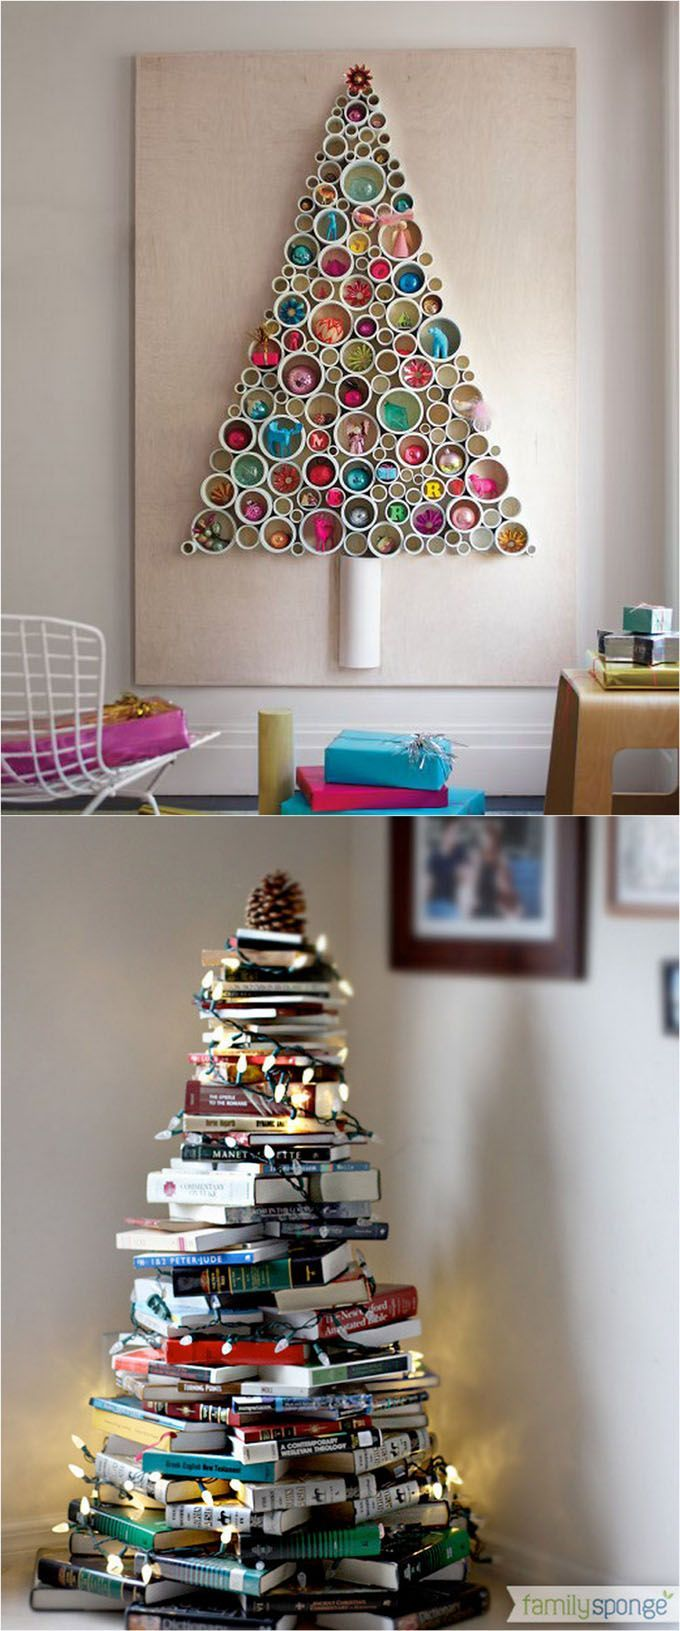 Unusual Christmas Tree Best 25 Unique Christmas Trees Ideas On Pinterest  Diy Christmas